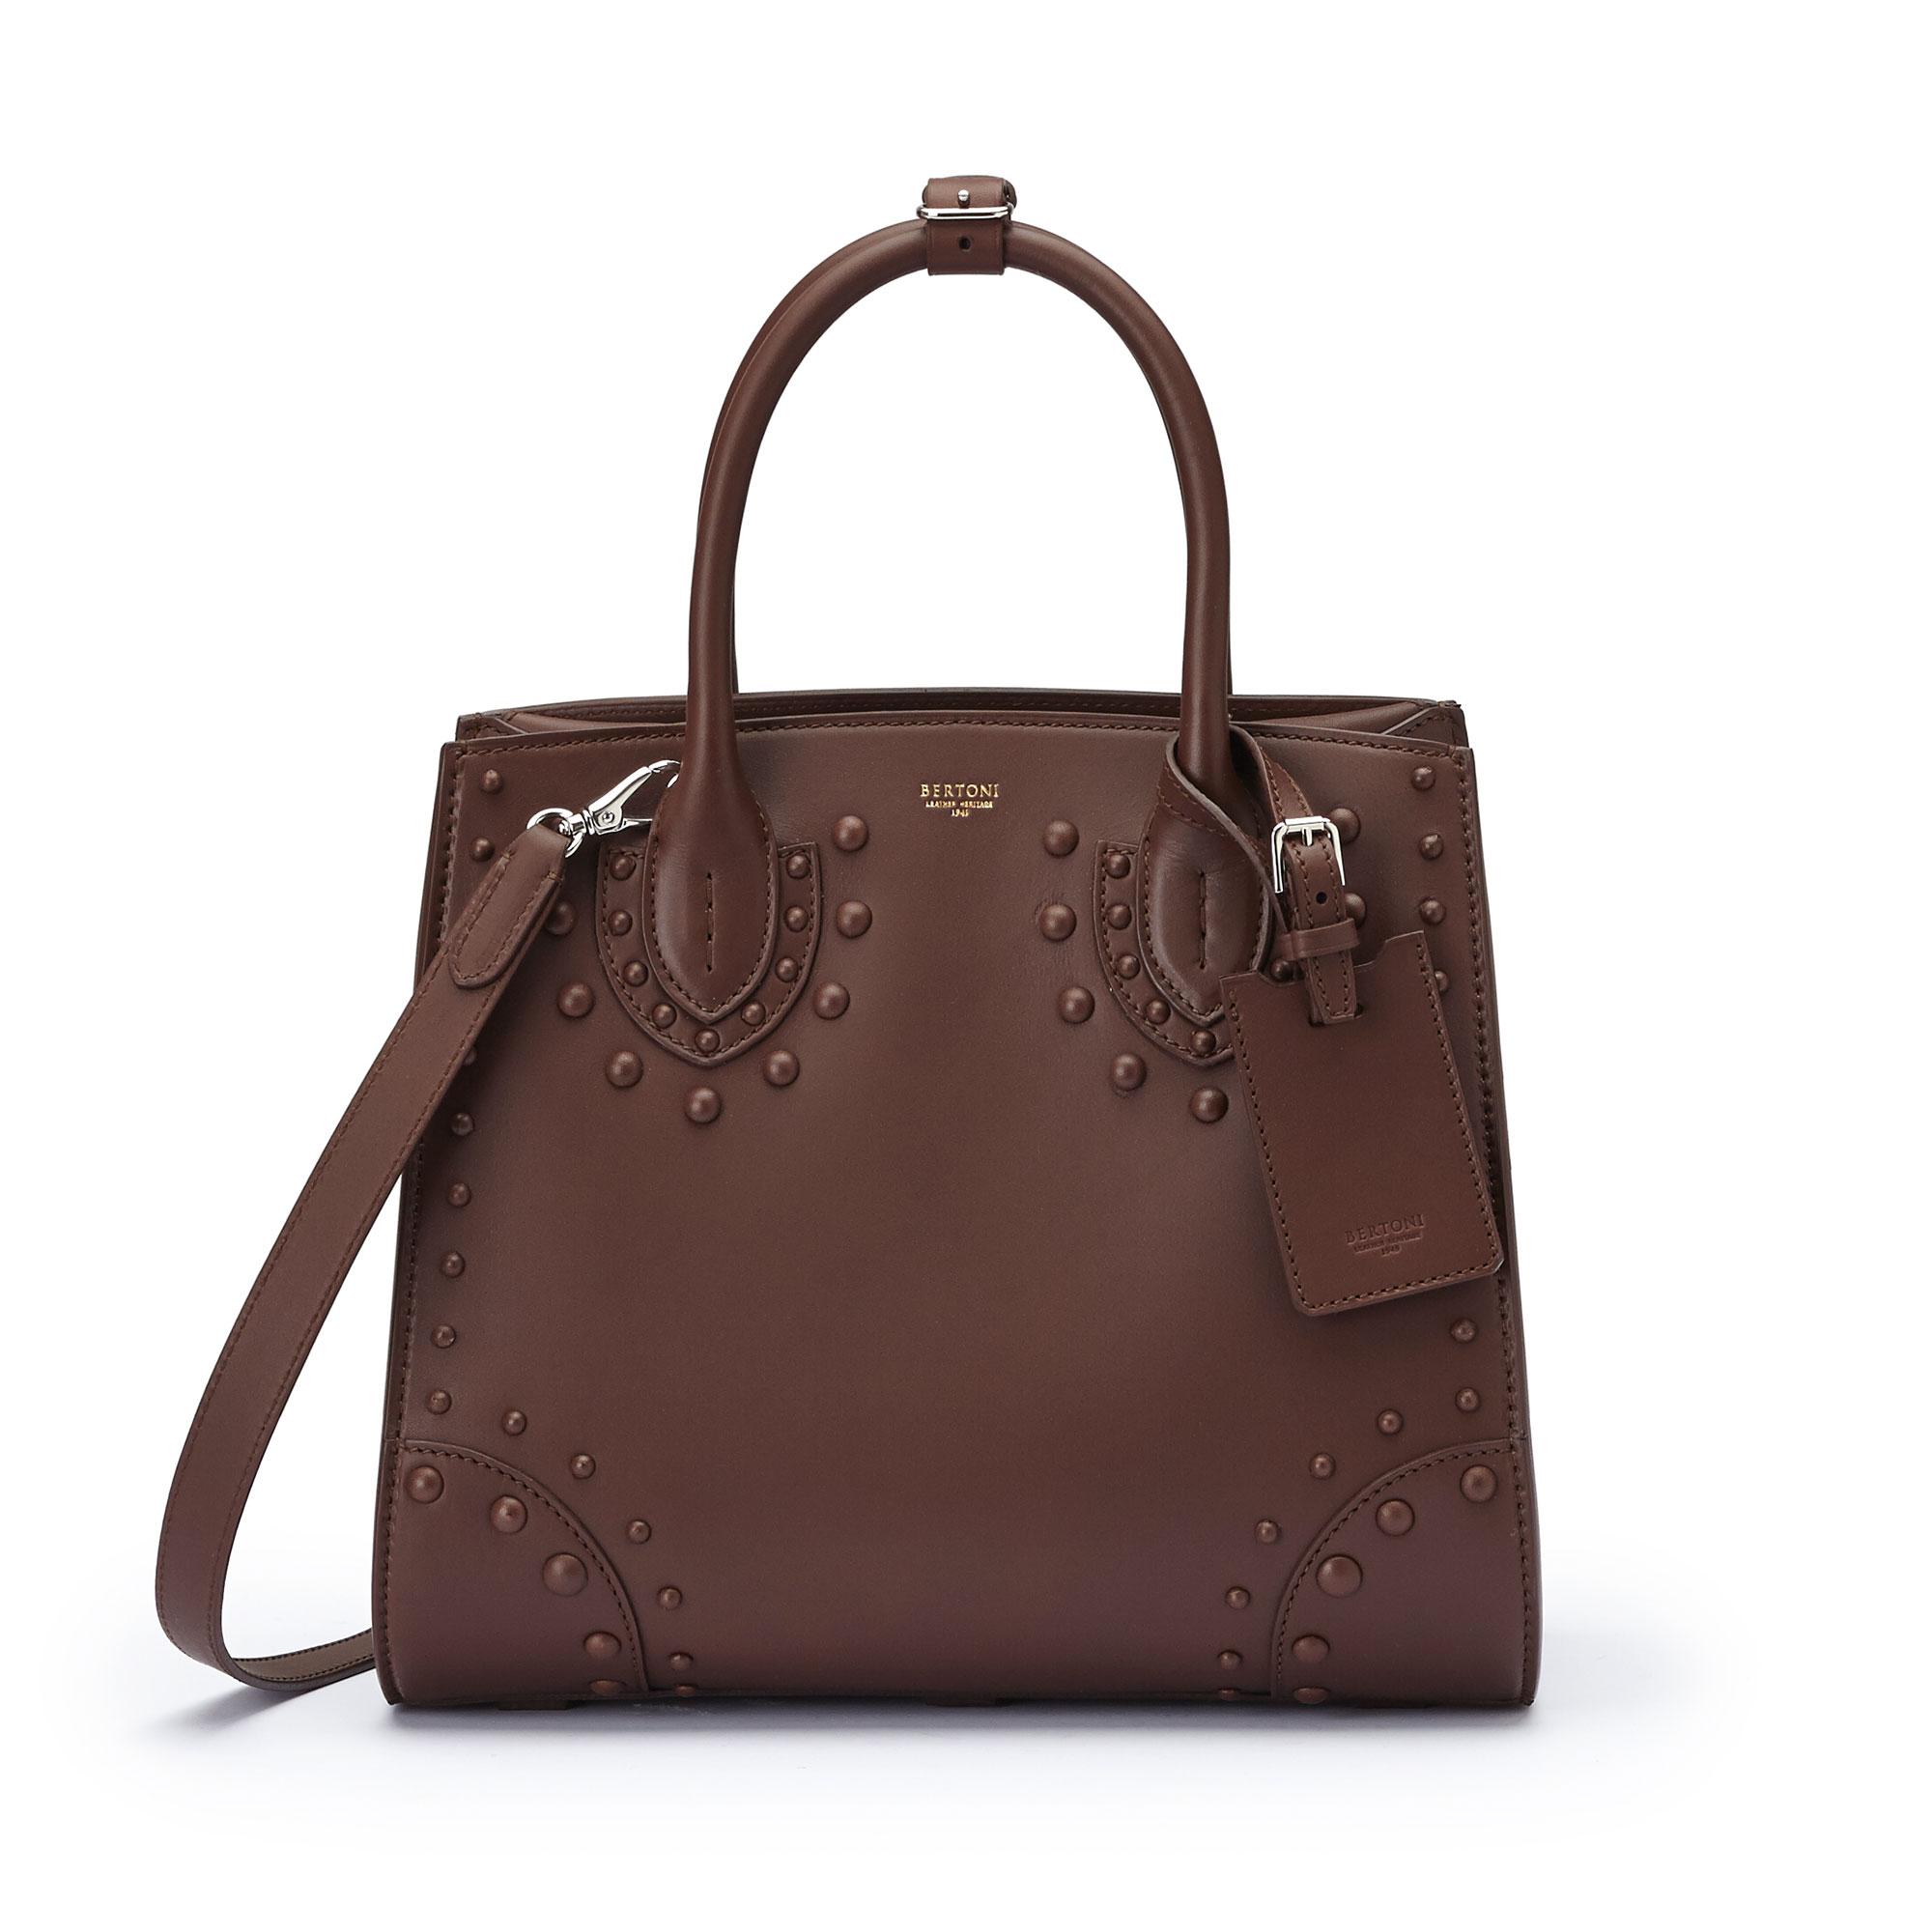 The brown french calf Darcy medium bag by Bertoni 1949 01